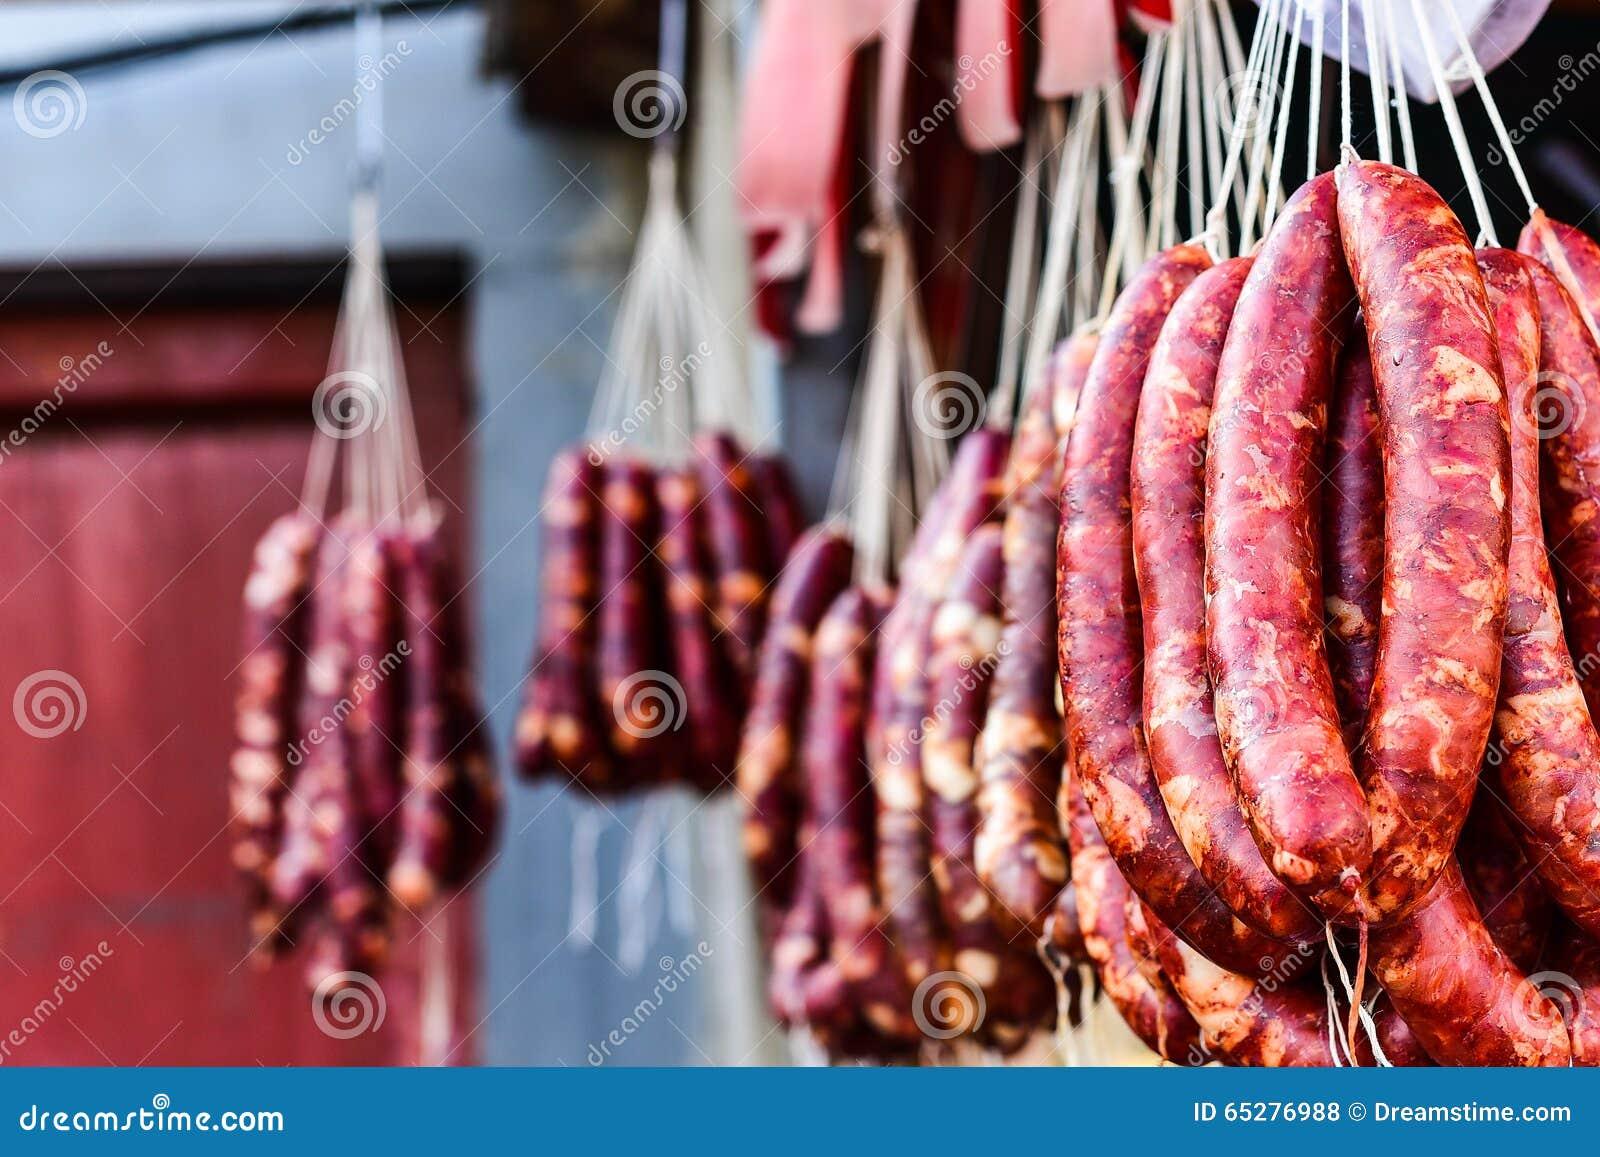 Italian pork sausage stock photo  Image of sasuage, exotic